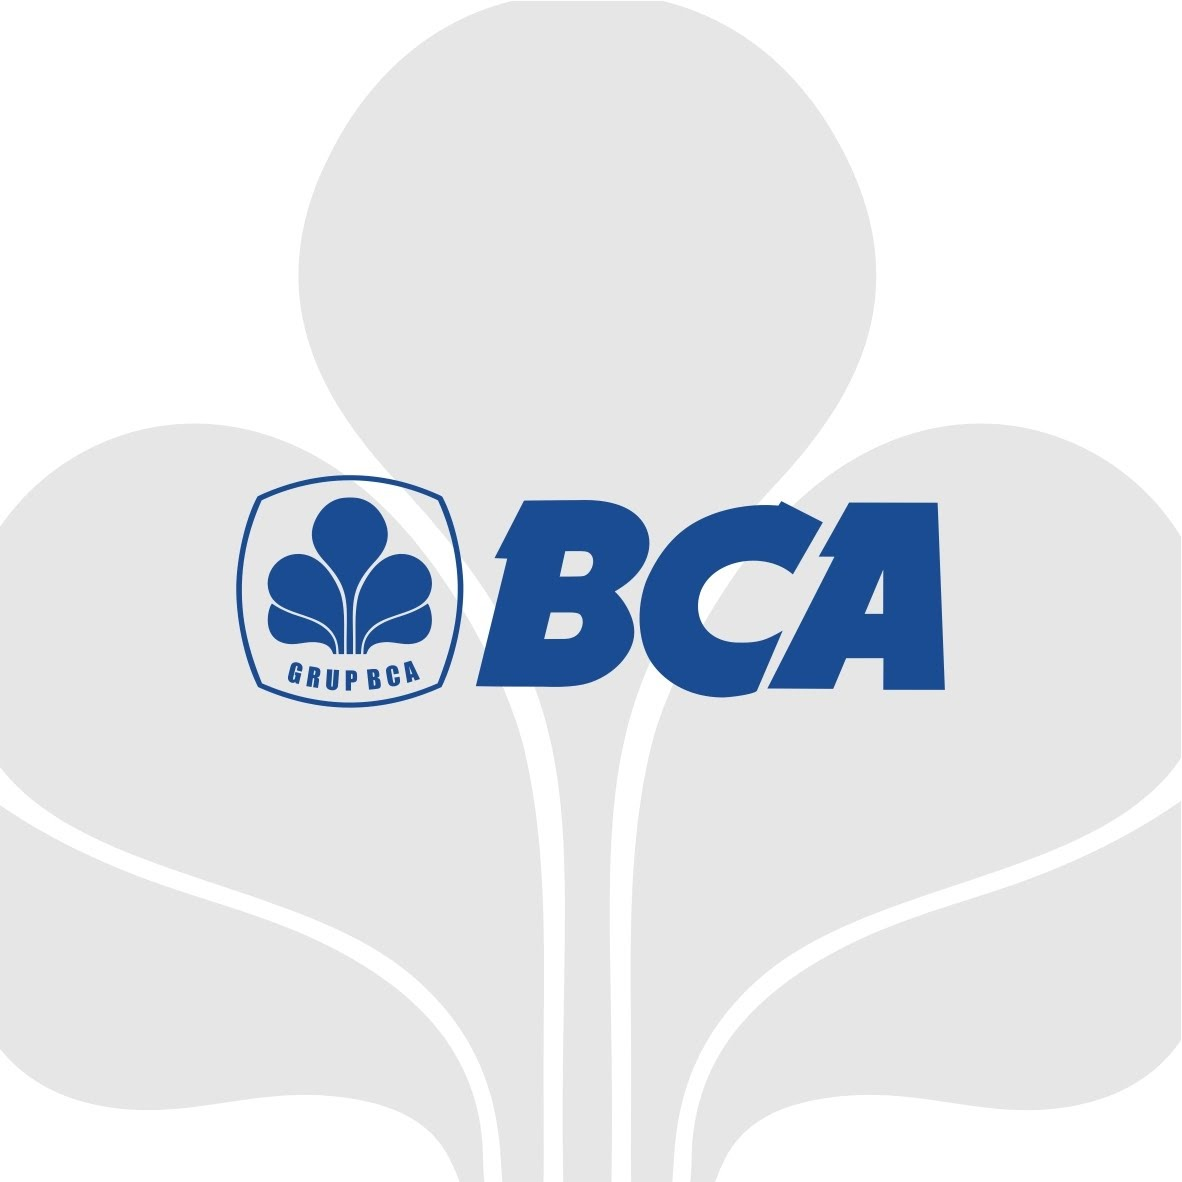 download file vector logo bank bca high quality file